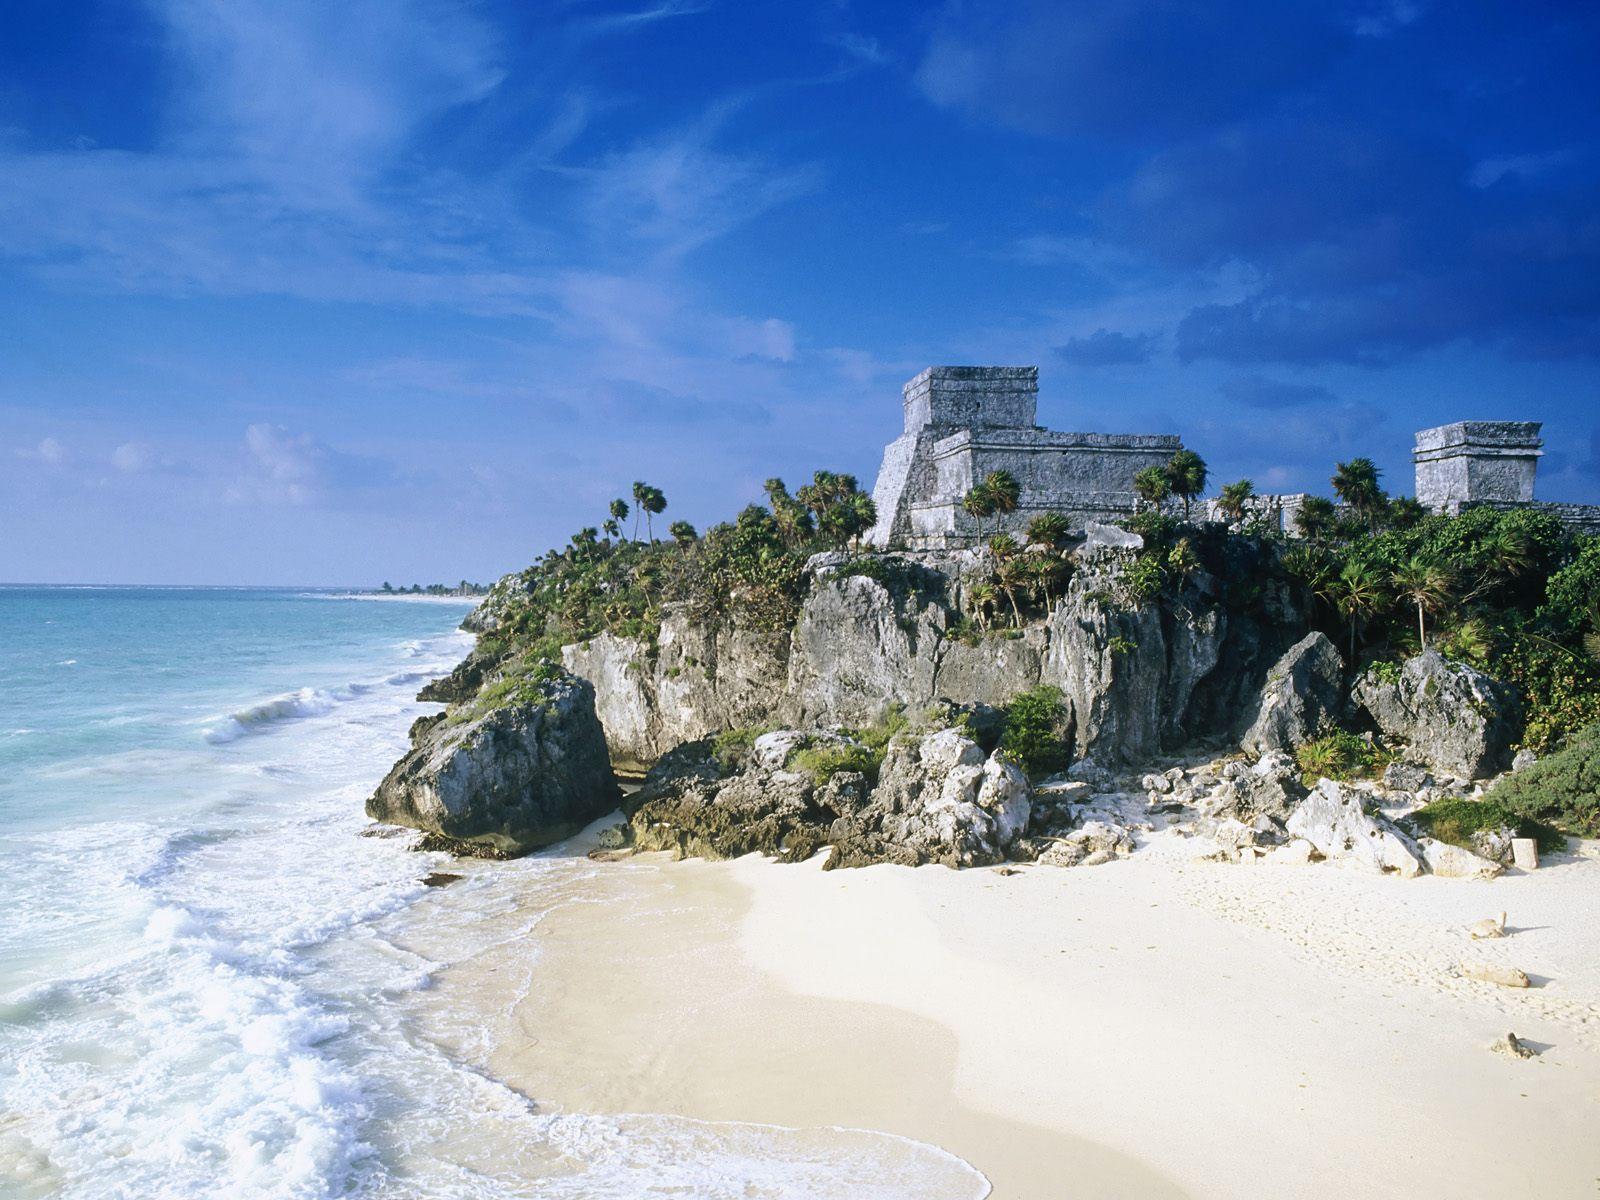 Riviera Maya Mexico  city images : ... Travel: Mexico Sun, sand and the Caribbean sea on the Riviera Maya